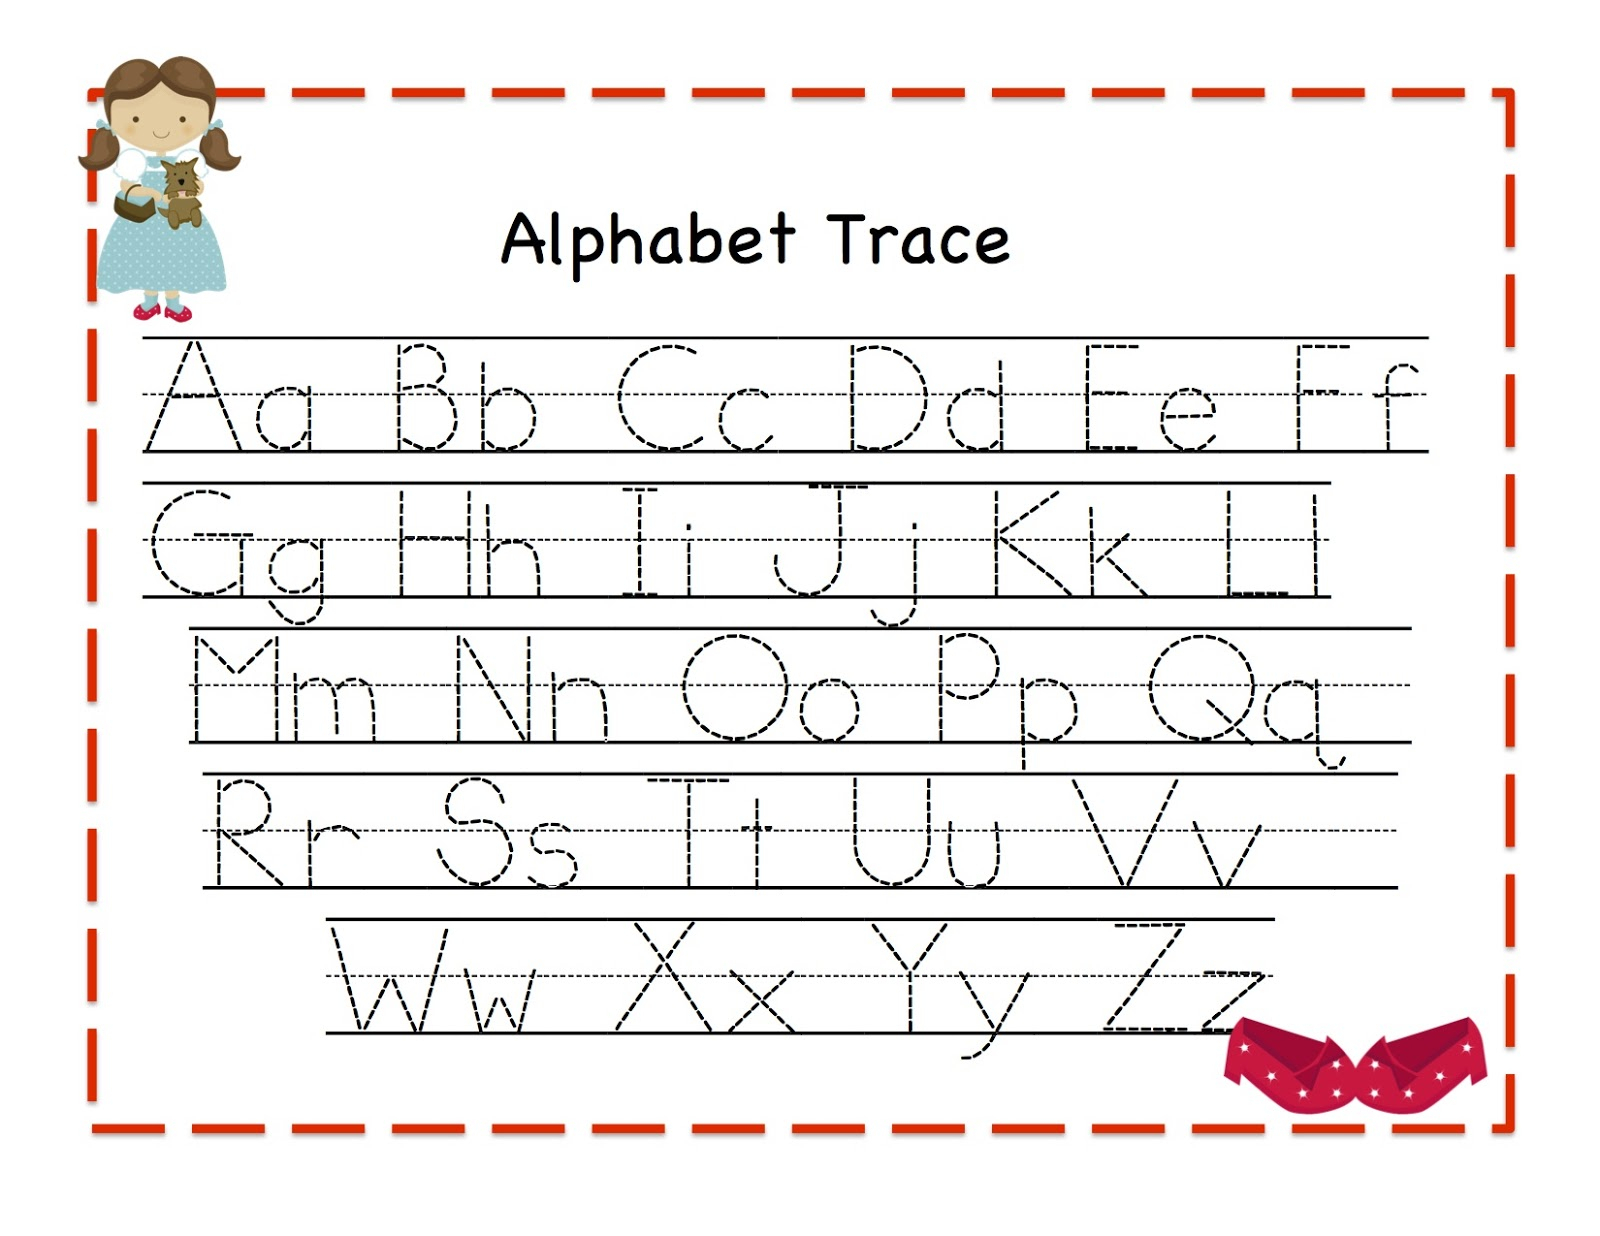 Free Alphabet Tracing Templates ] - Tracing Letters Template for Printable Tracing Alphabet Letters Az